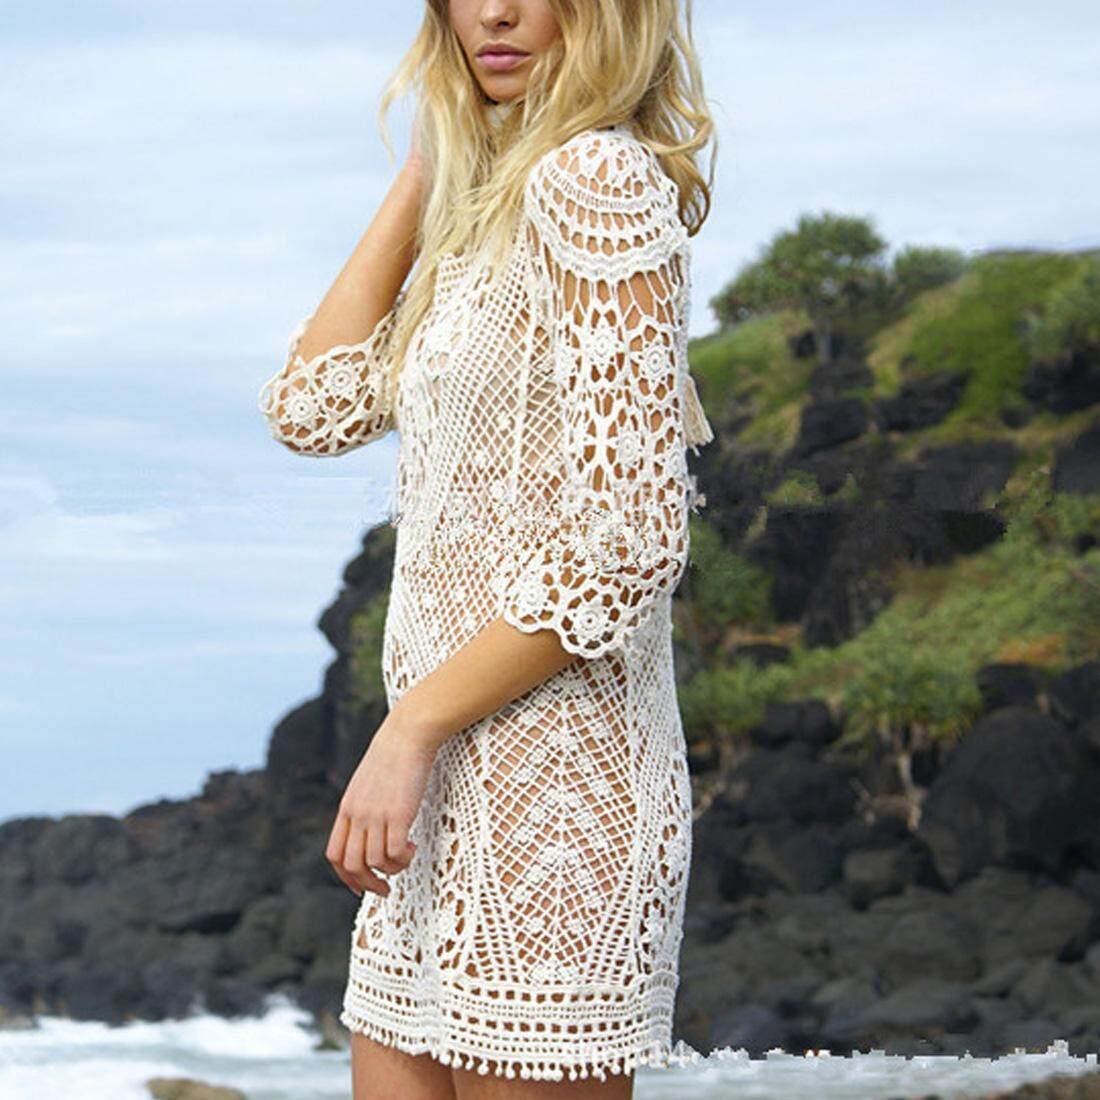 7fa78a3d88e2 New Summer Swimsuit Lace Hollow Crochet Beach Bikini Cover Up 3 4 Sleeve  Women Tops